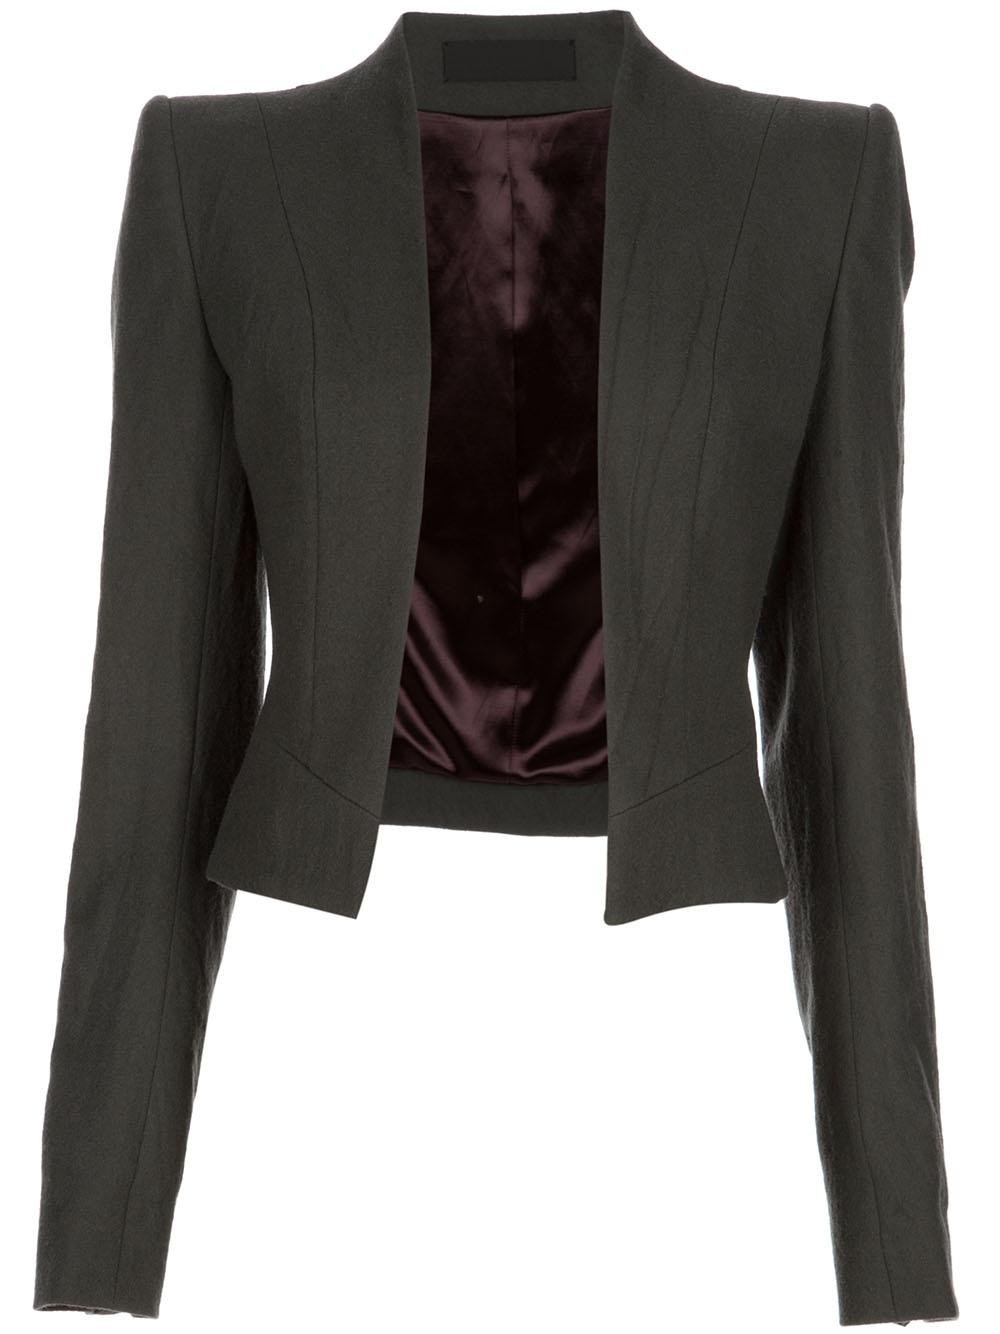 Grey Short Jacket - My Jacket